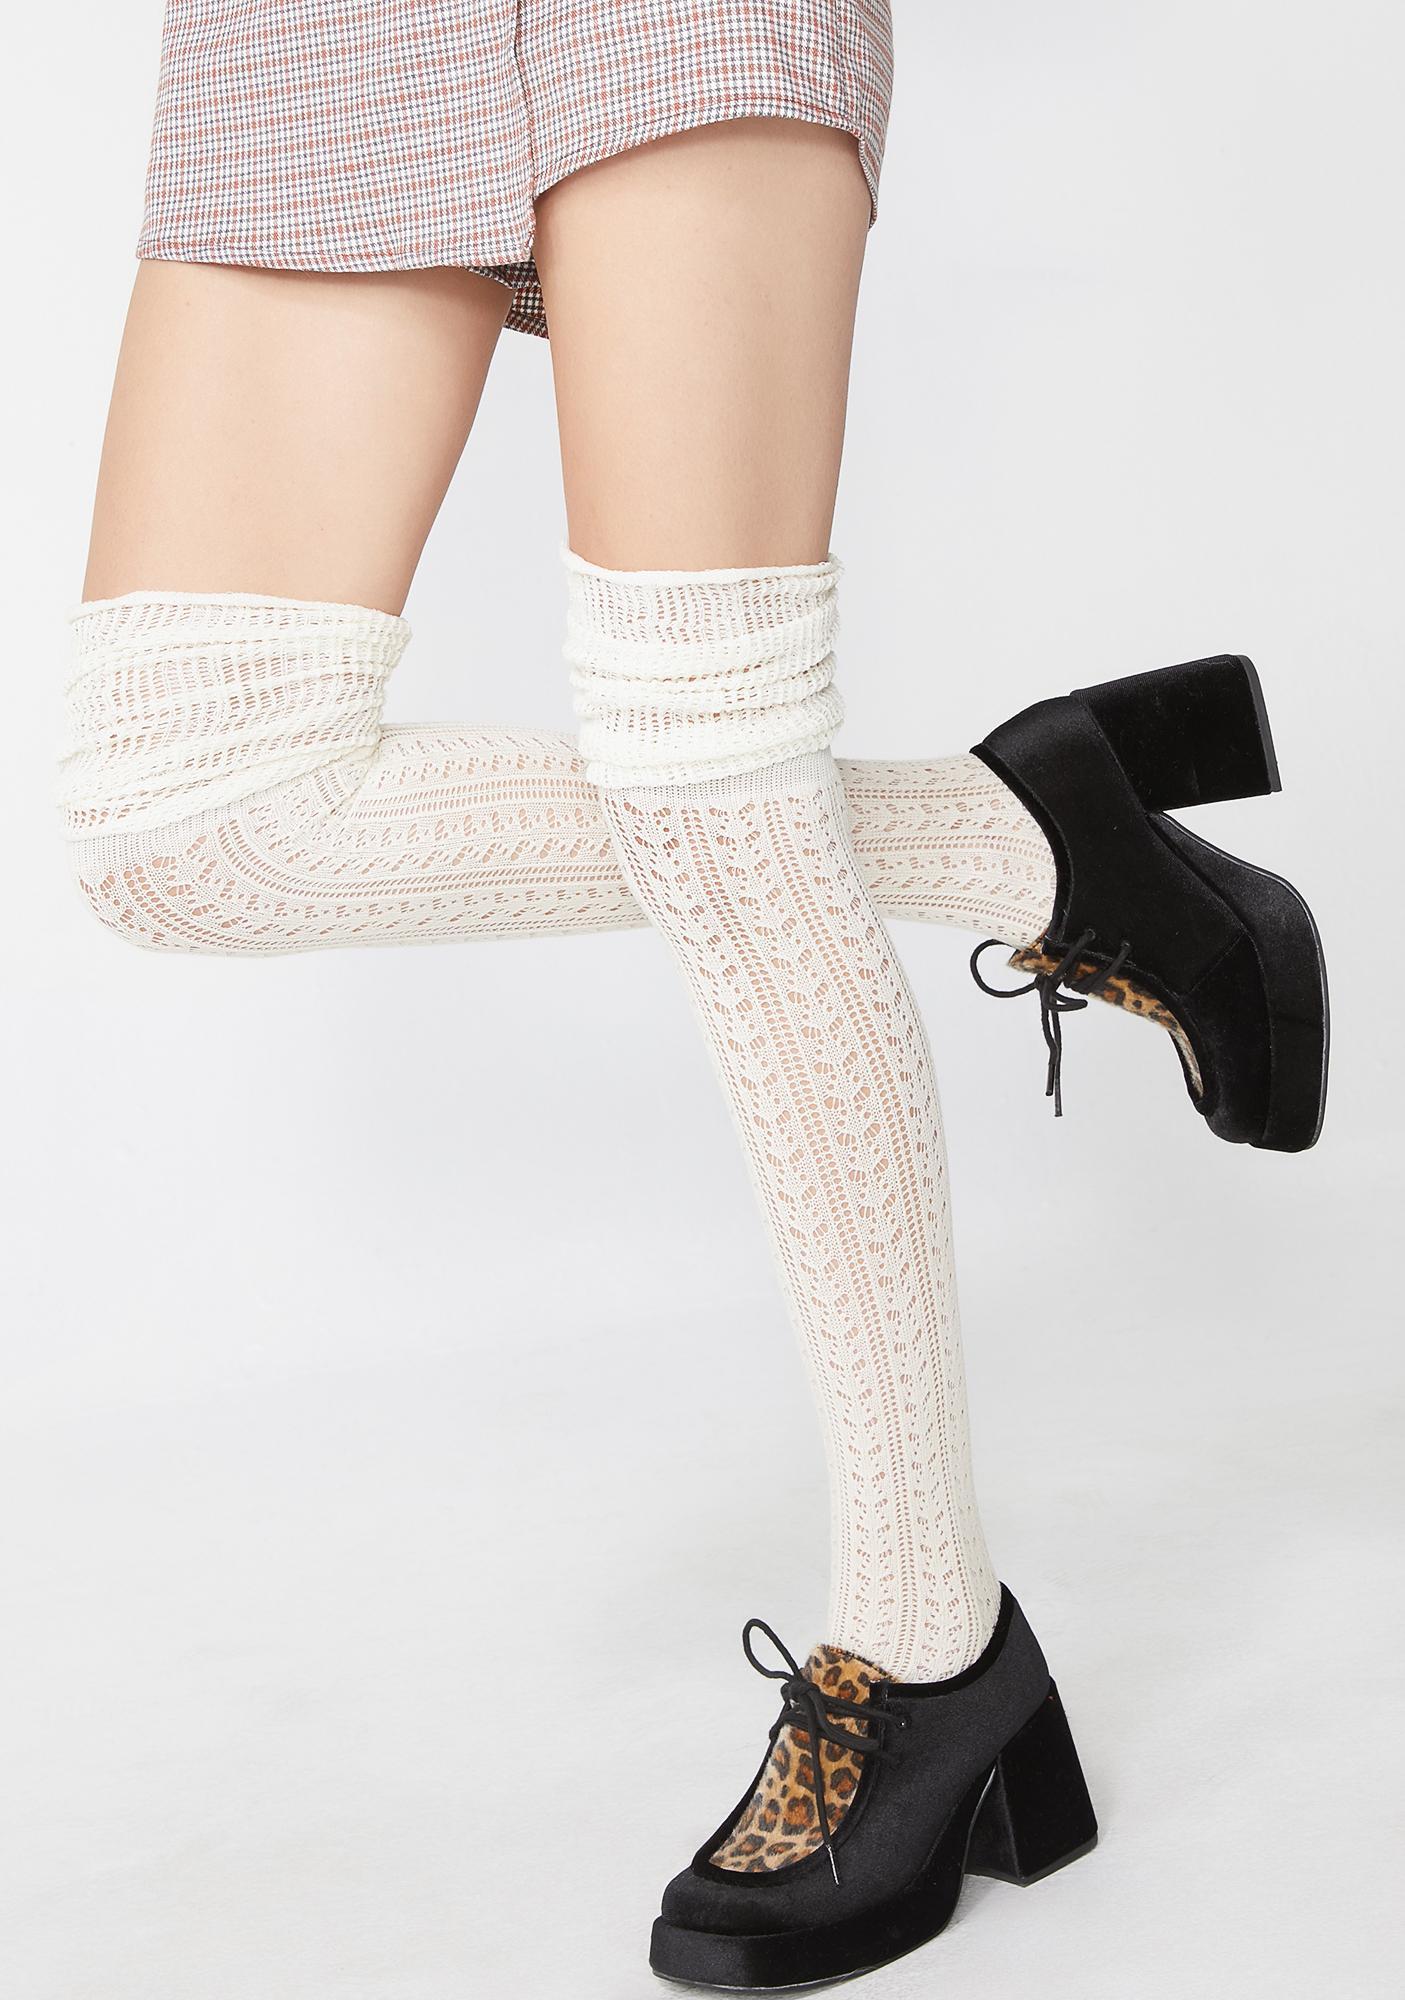 Innocent BB Doll Thigh High Socks